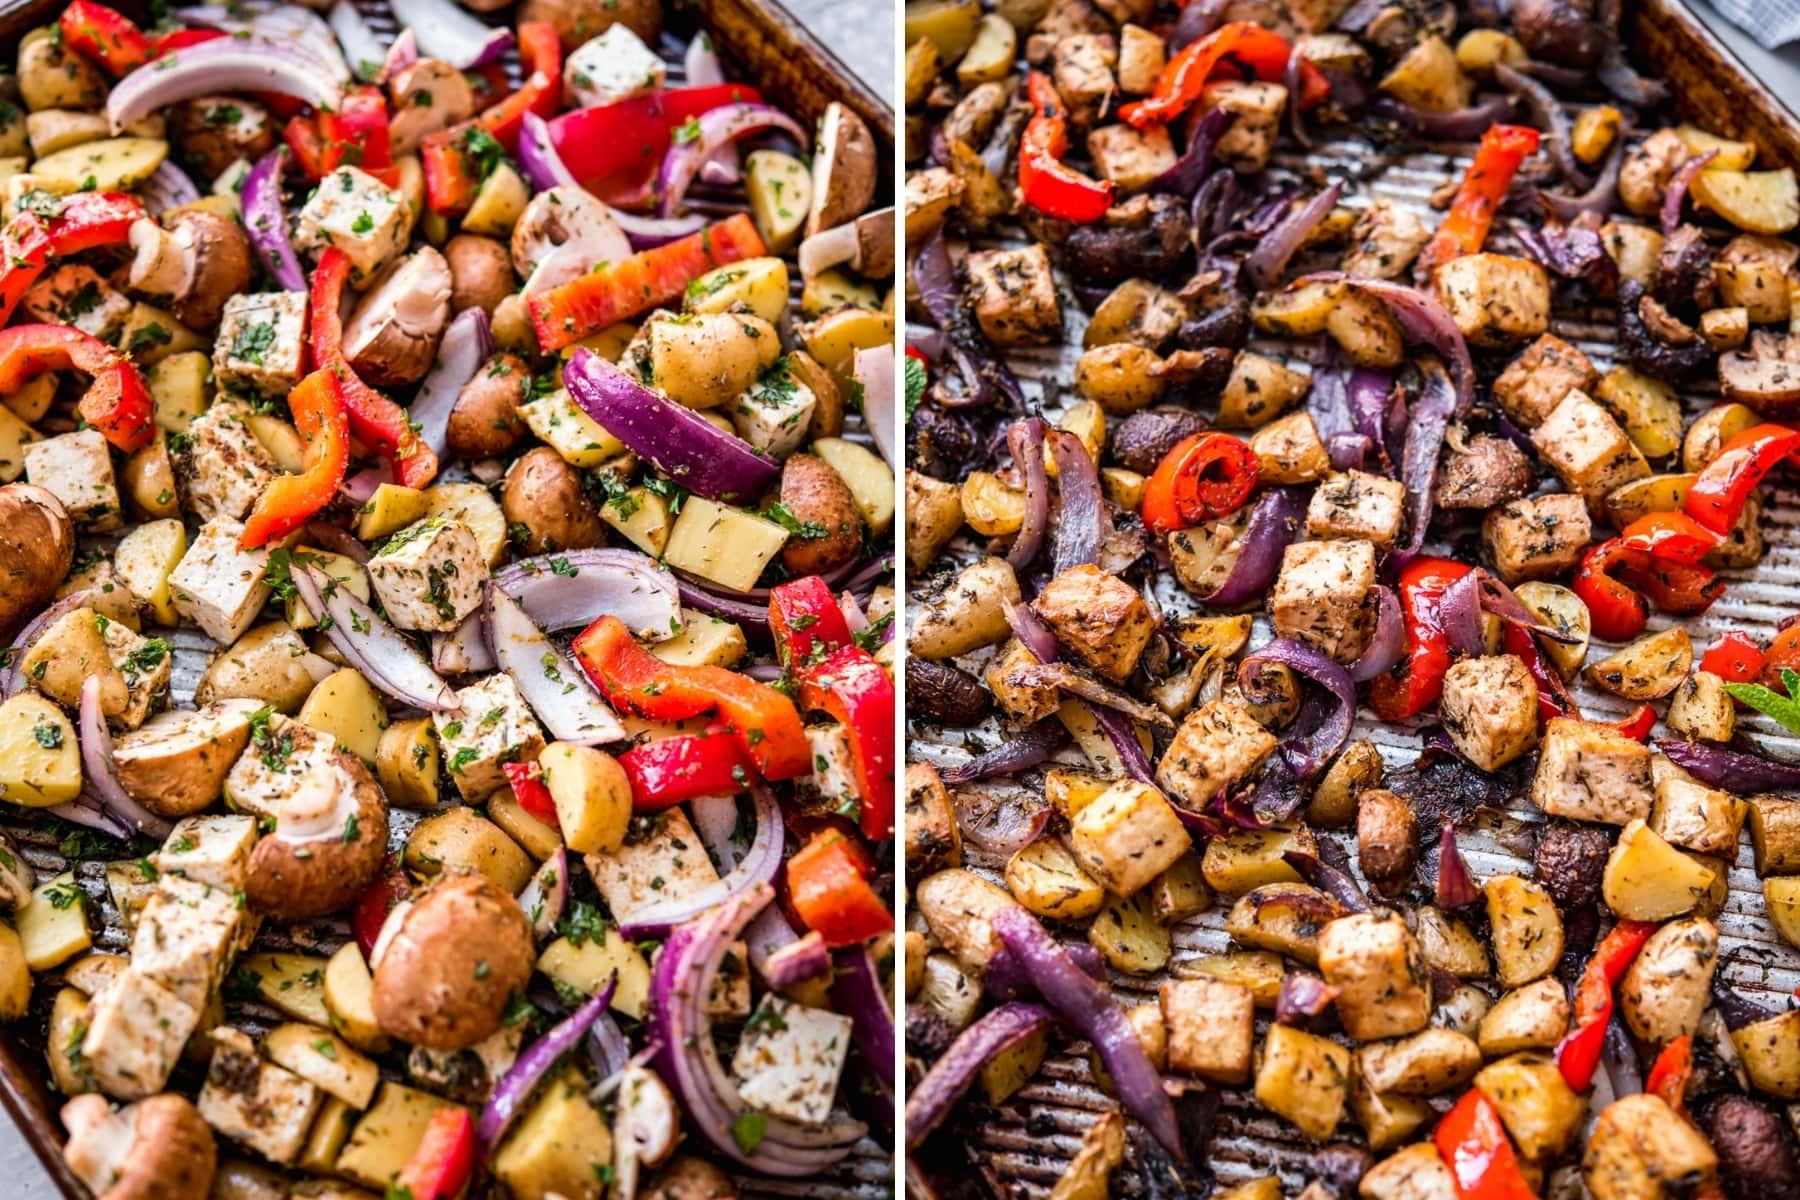 before and after roasting ingredients for vegan mediterranean sheet pan dinner.